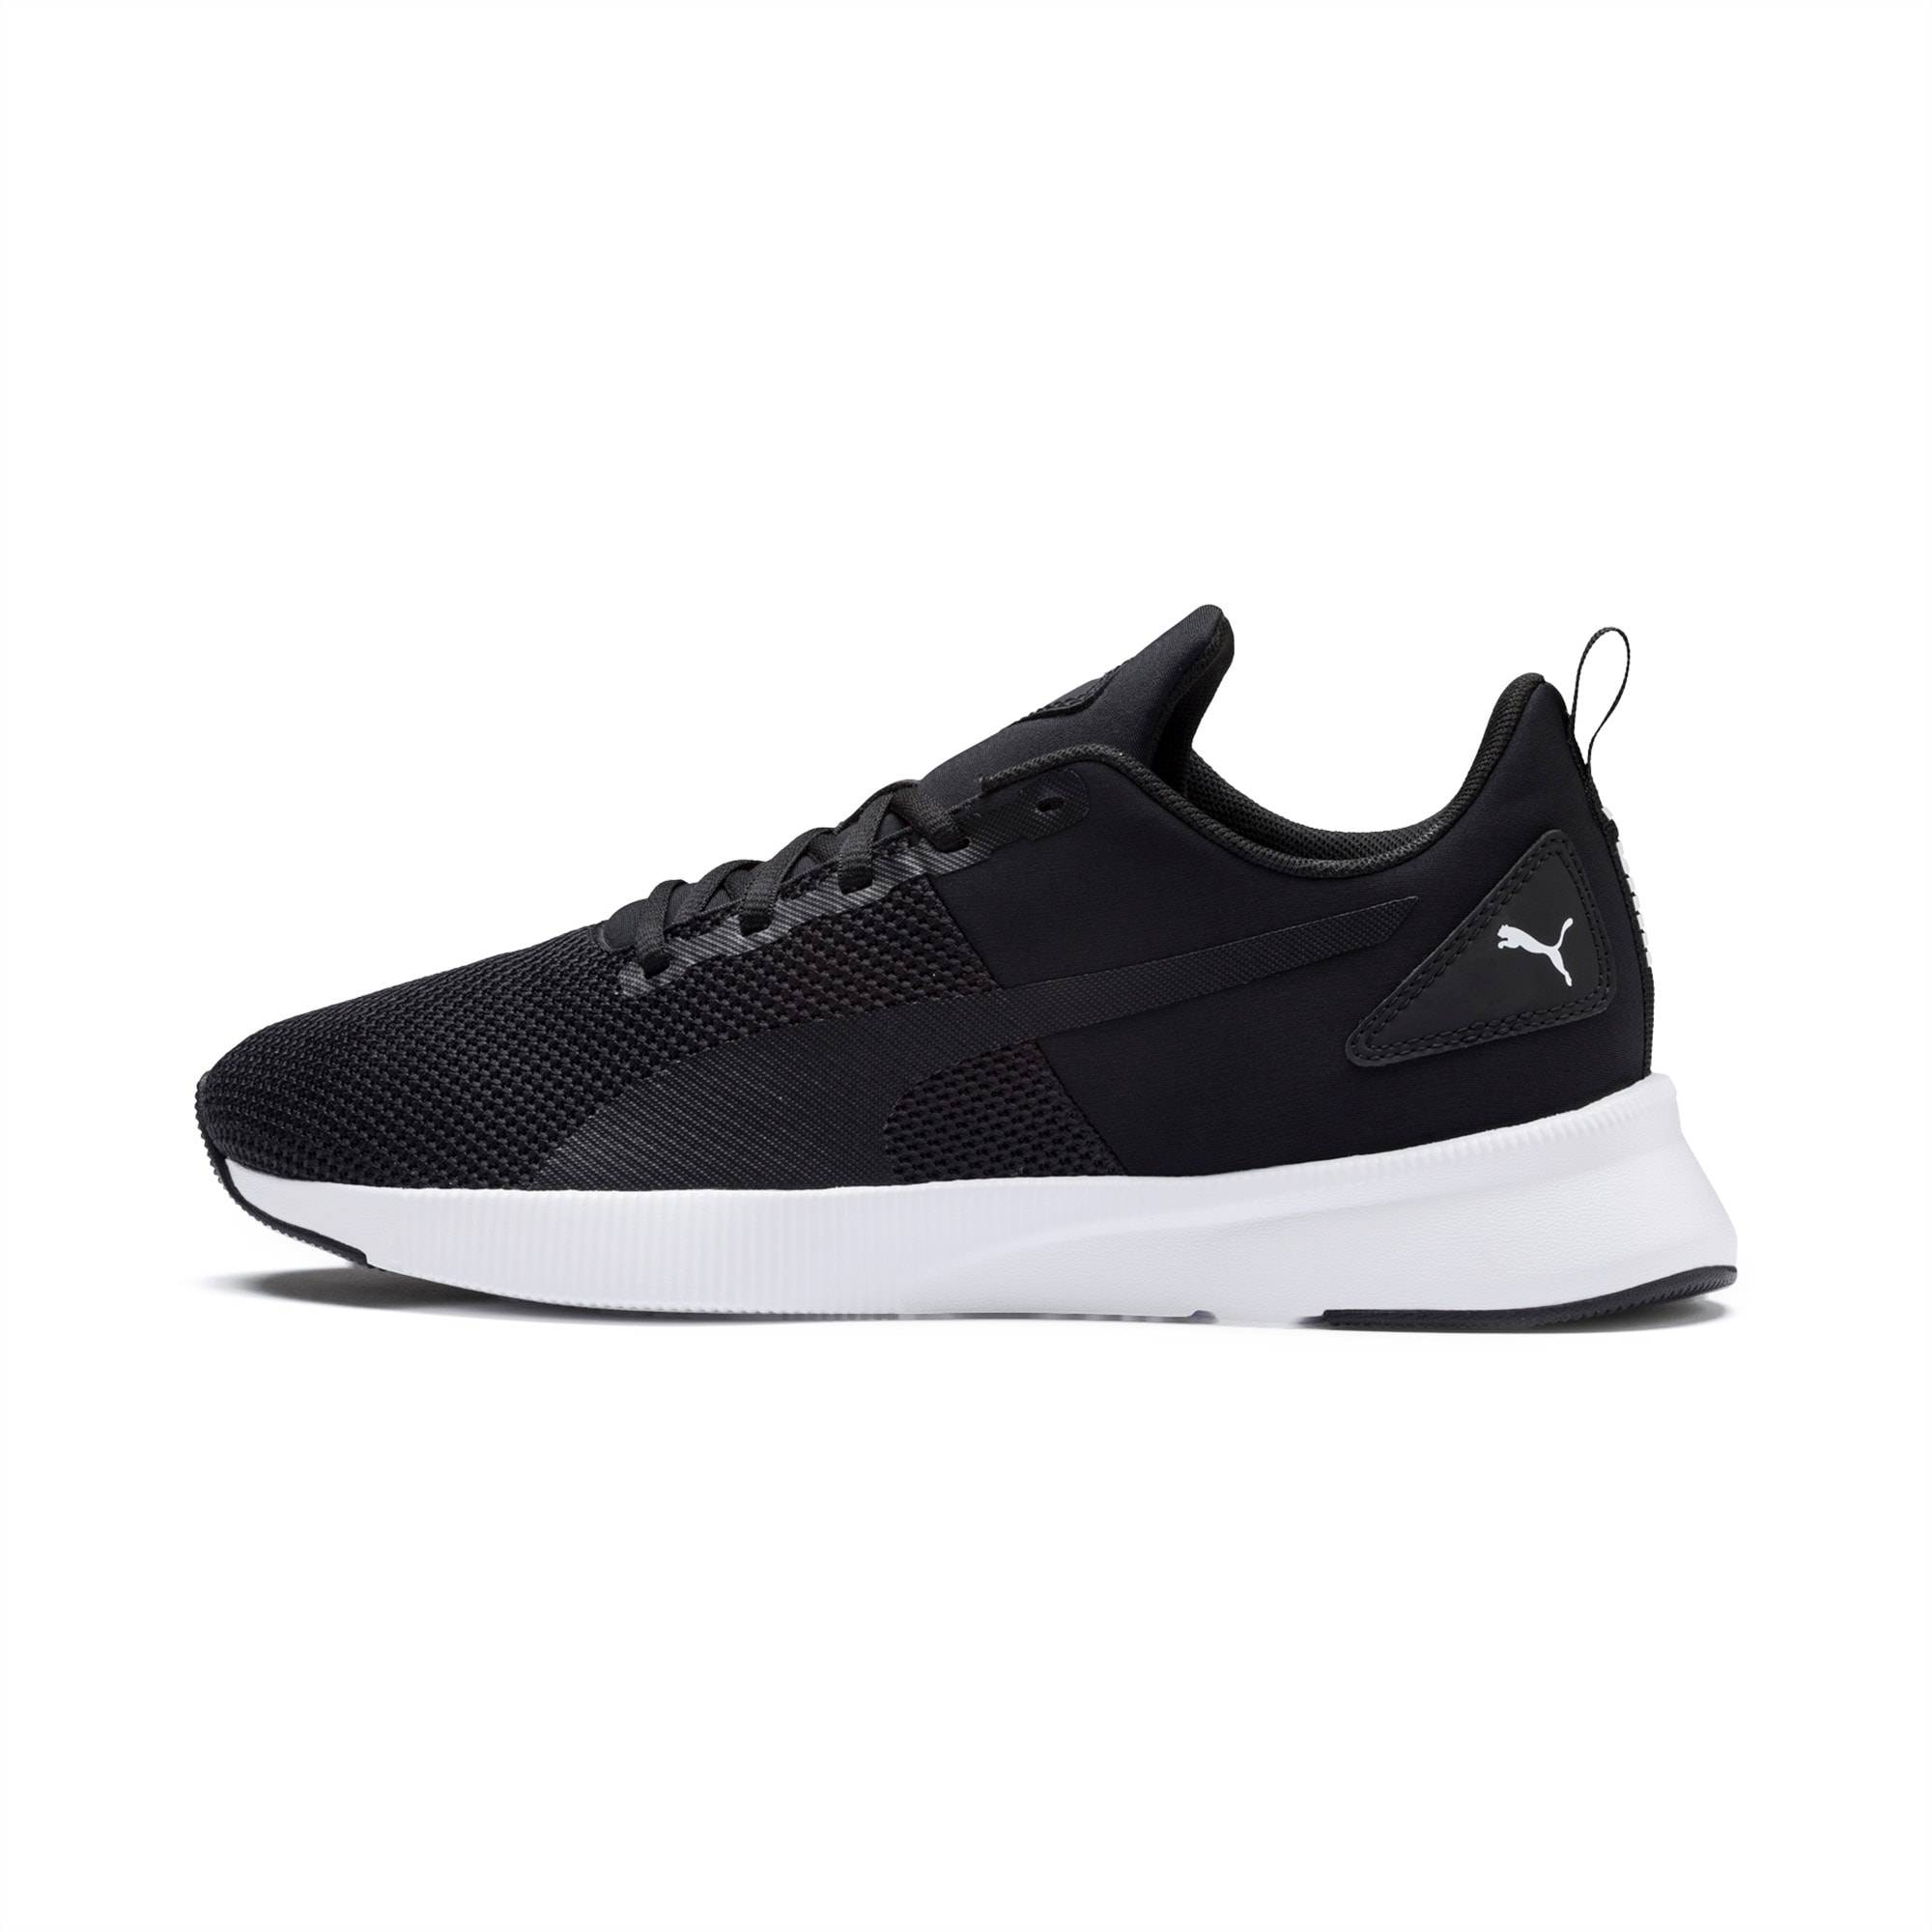 PUMA Chaussure de course Flyer Runner, Noir/Blanc, Taille 35.5, Chaussures